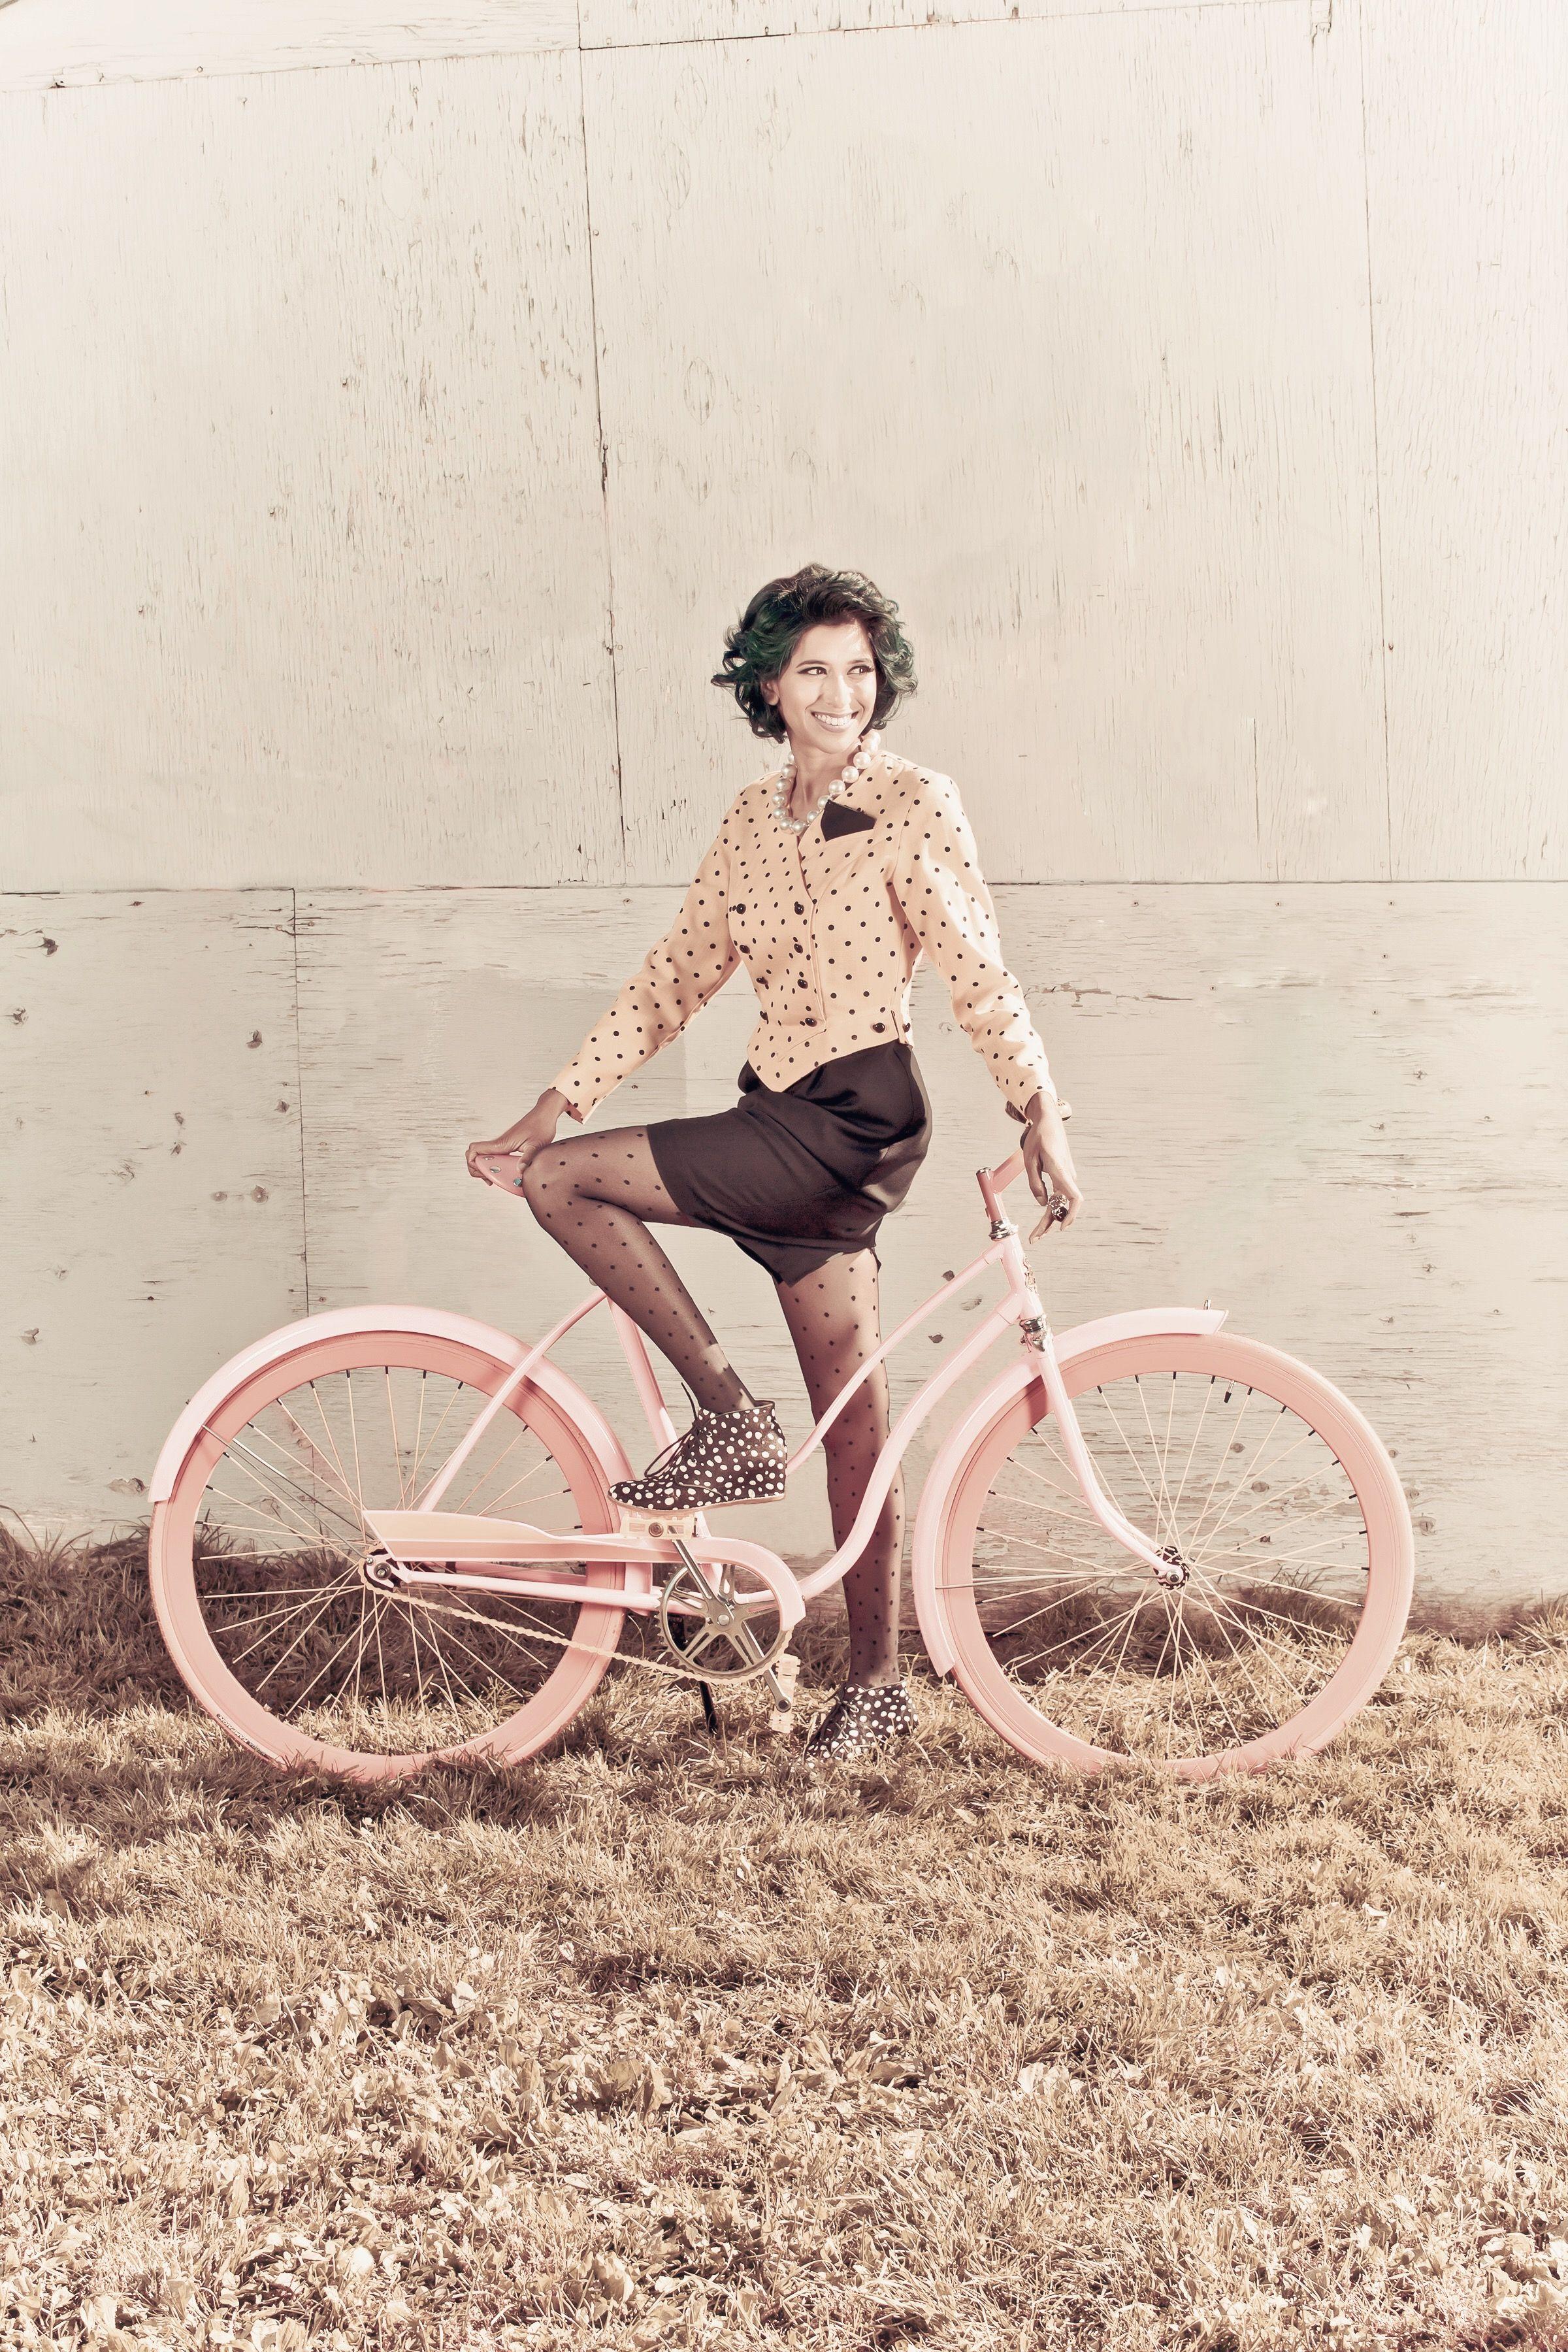 Ottawa Vintage Clothing Show Bicycle Girl Cycling Fashion Bike Style